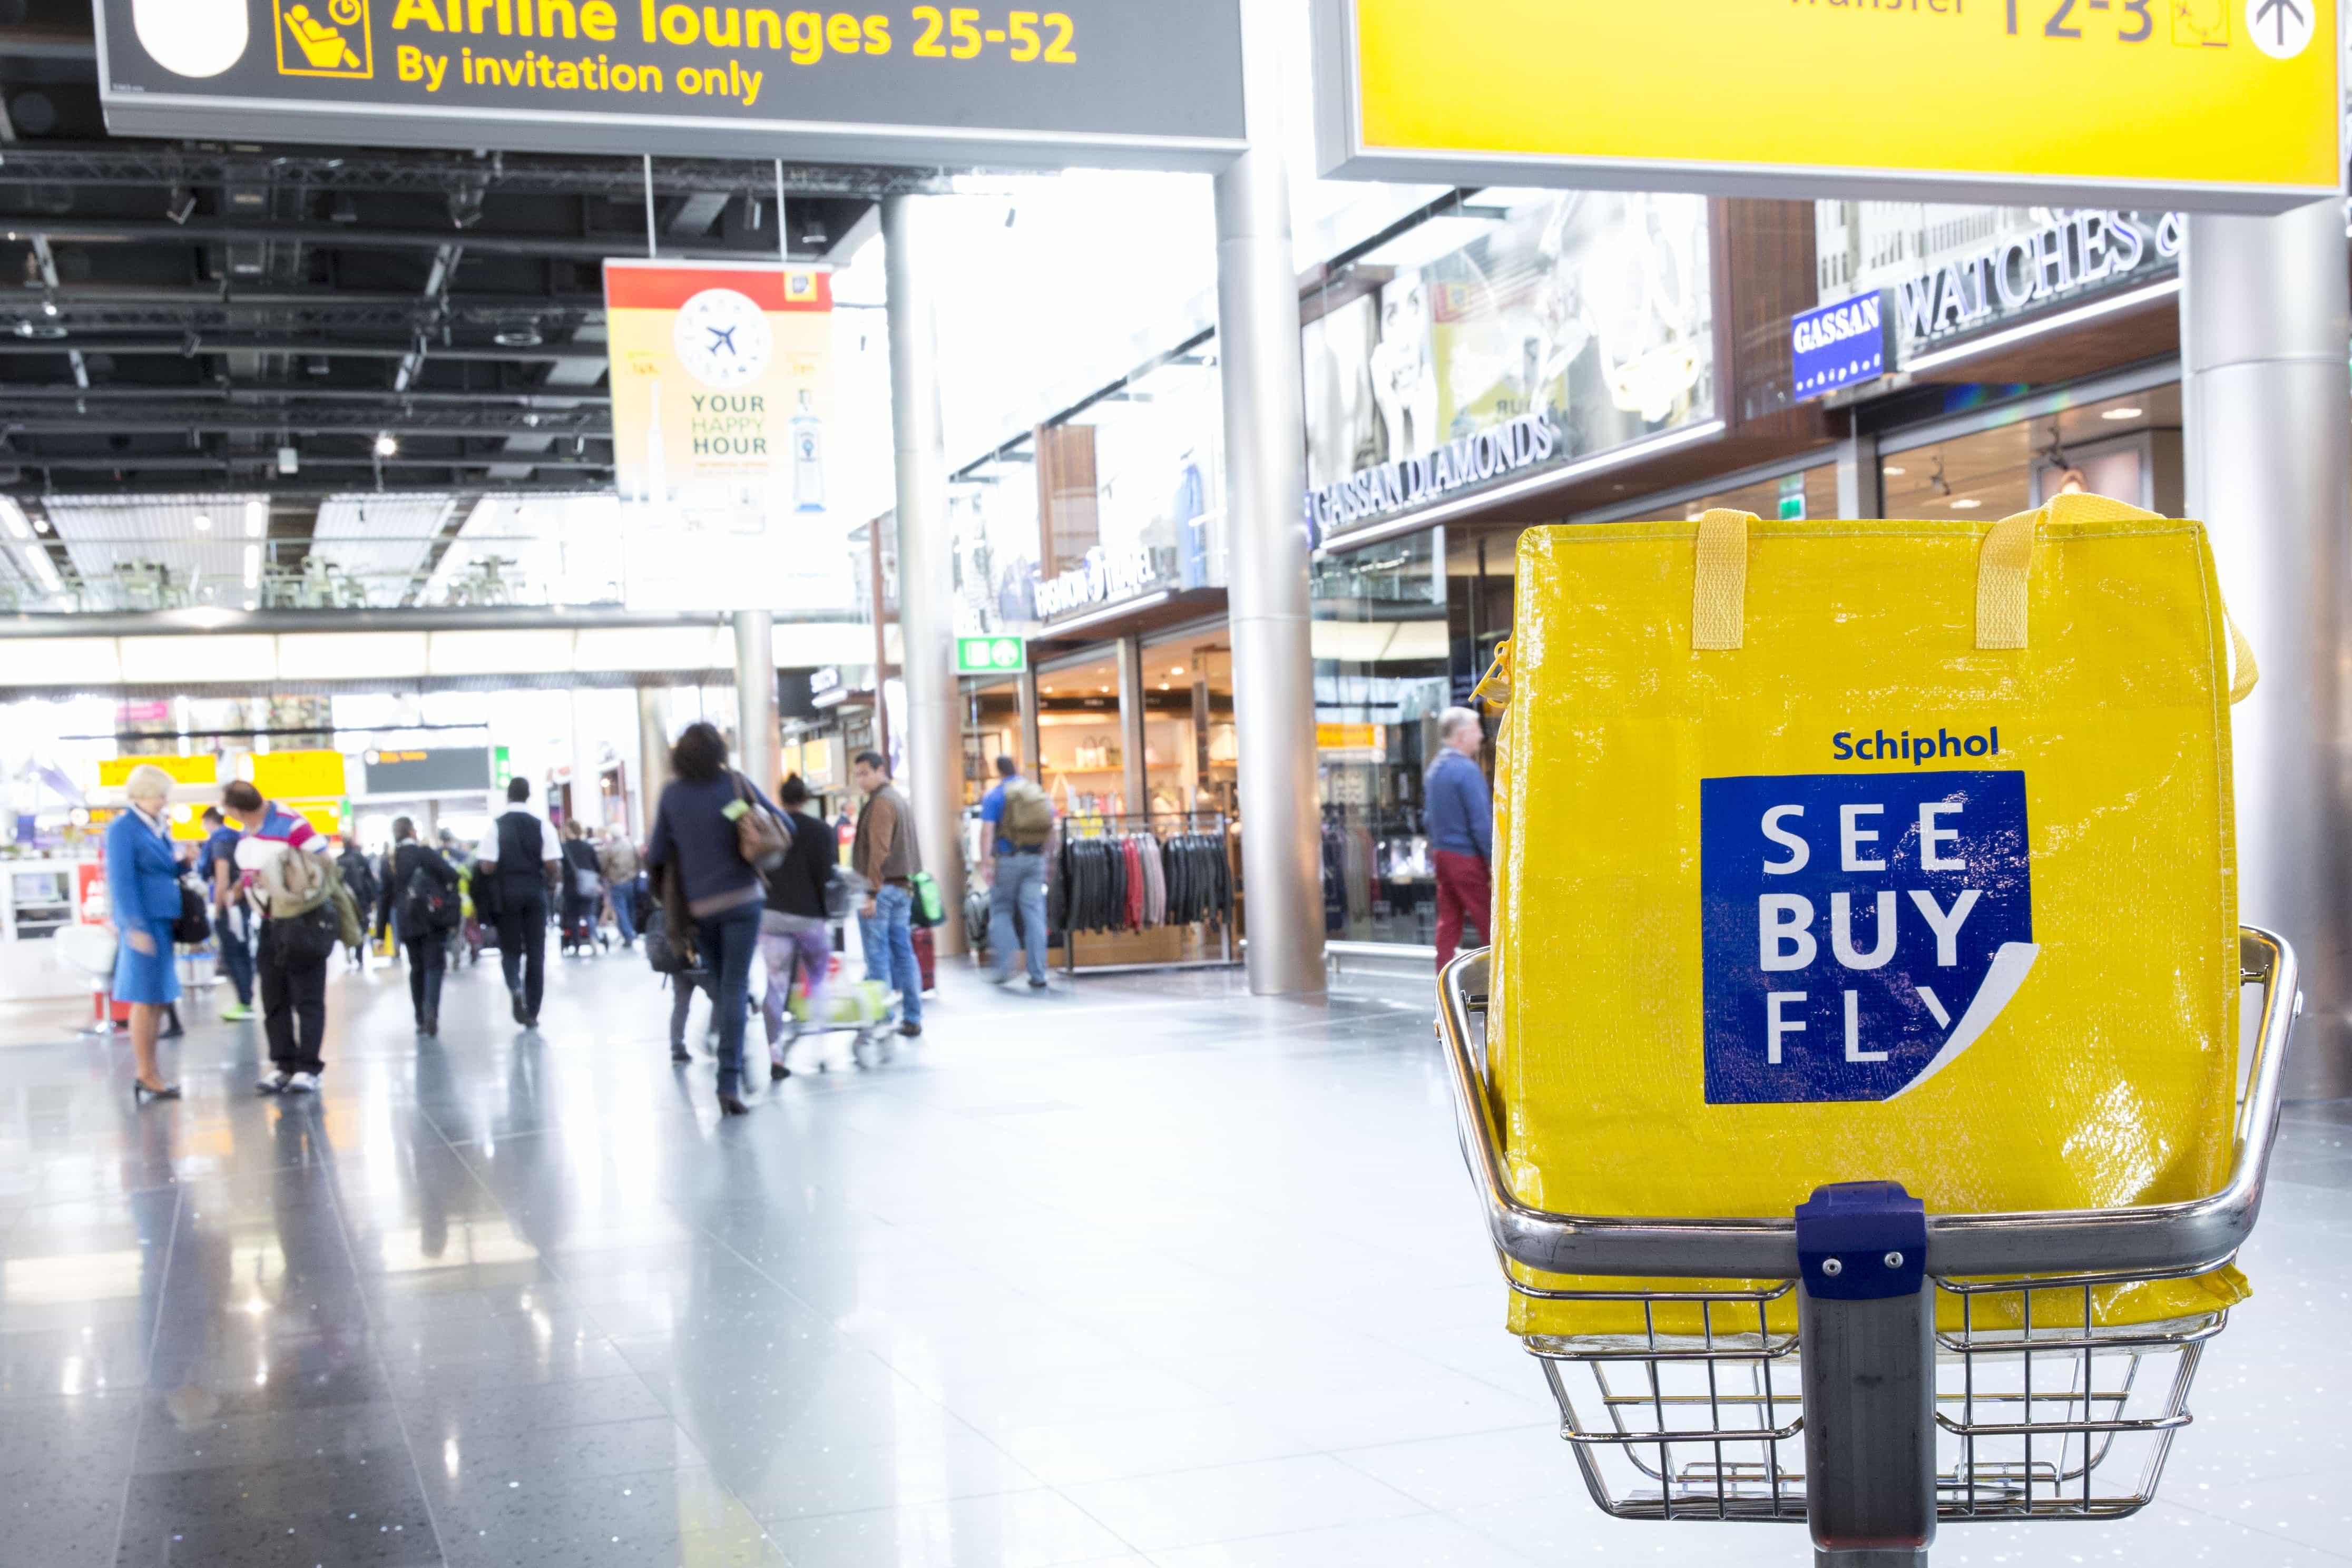 SeeBuyFly, See Buy Fly, tax free shoppen, belastingvrij winkelen, belastingvrij shoppen, belasting vrij Schiphol, Tax free Schiphol, Schiphol, Schiphol airport, vliegveld Schiphol, winkelen Schiphol, winkelen op Schiphol, vliegveld winkelen, aanbiedingen vliegveld winkels, Travel Rumors, happy hour SeeBuyFly, happy hour see buy fly, happy hour Schiphol, korting Schiphol, korting SeeBuyFly, korting See Buy Fly, geurtjes Schiphol, geurtjes SeeBuyFly